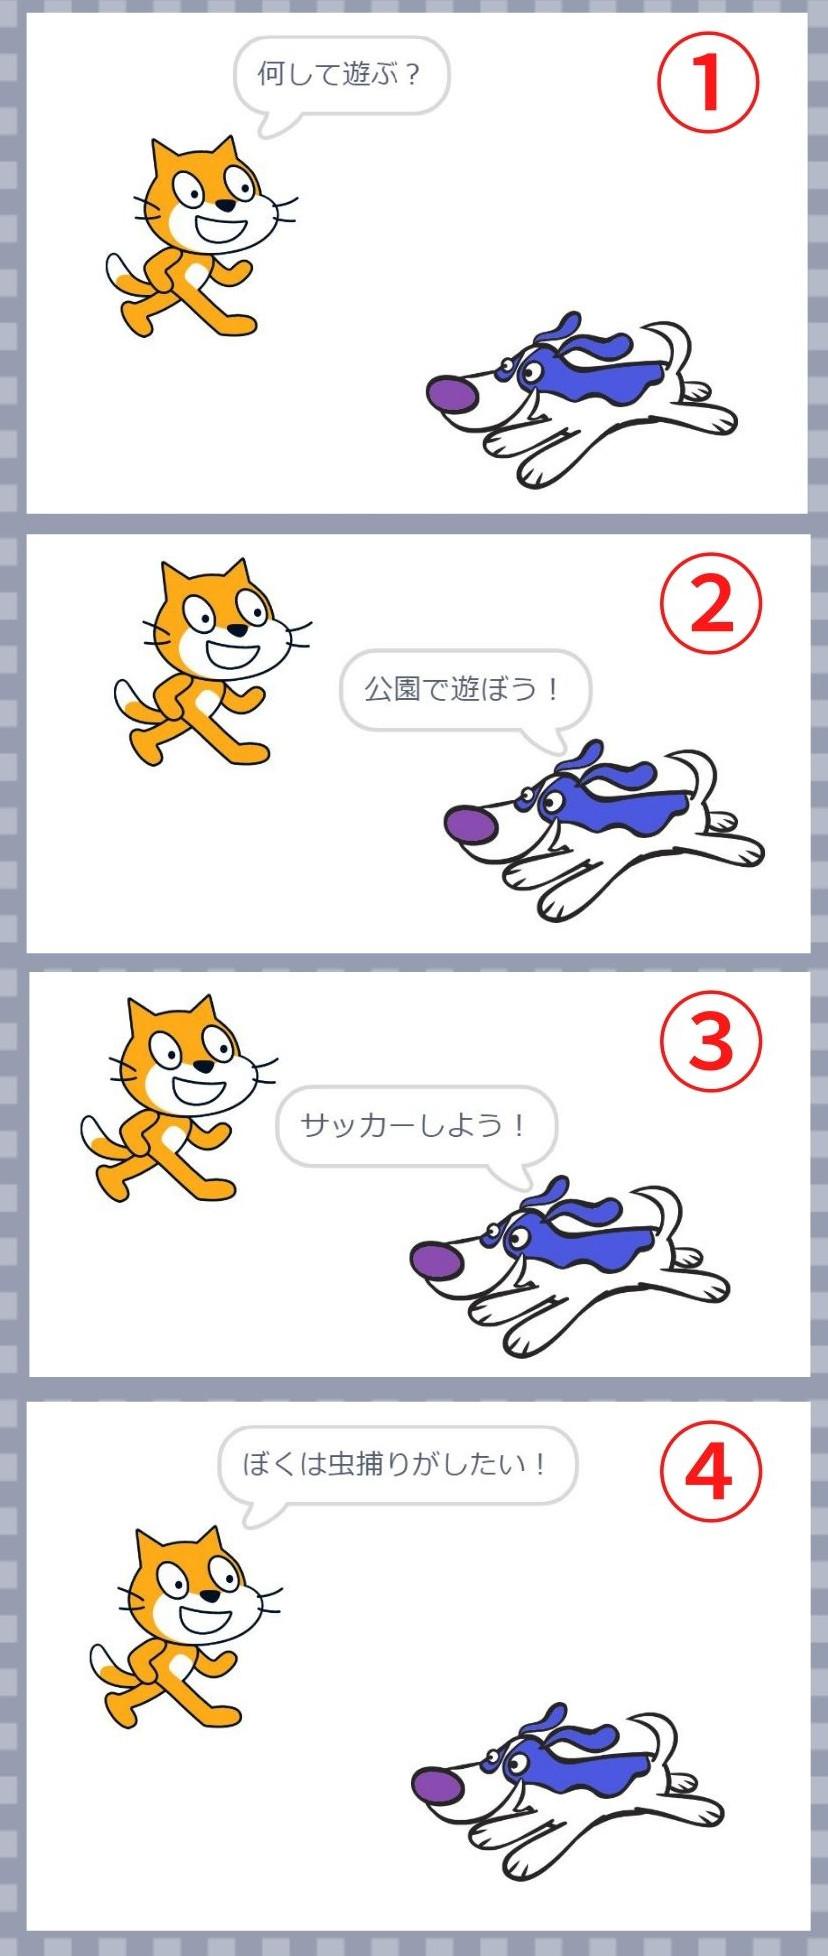 Scratch メッセージ(17)